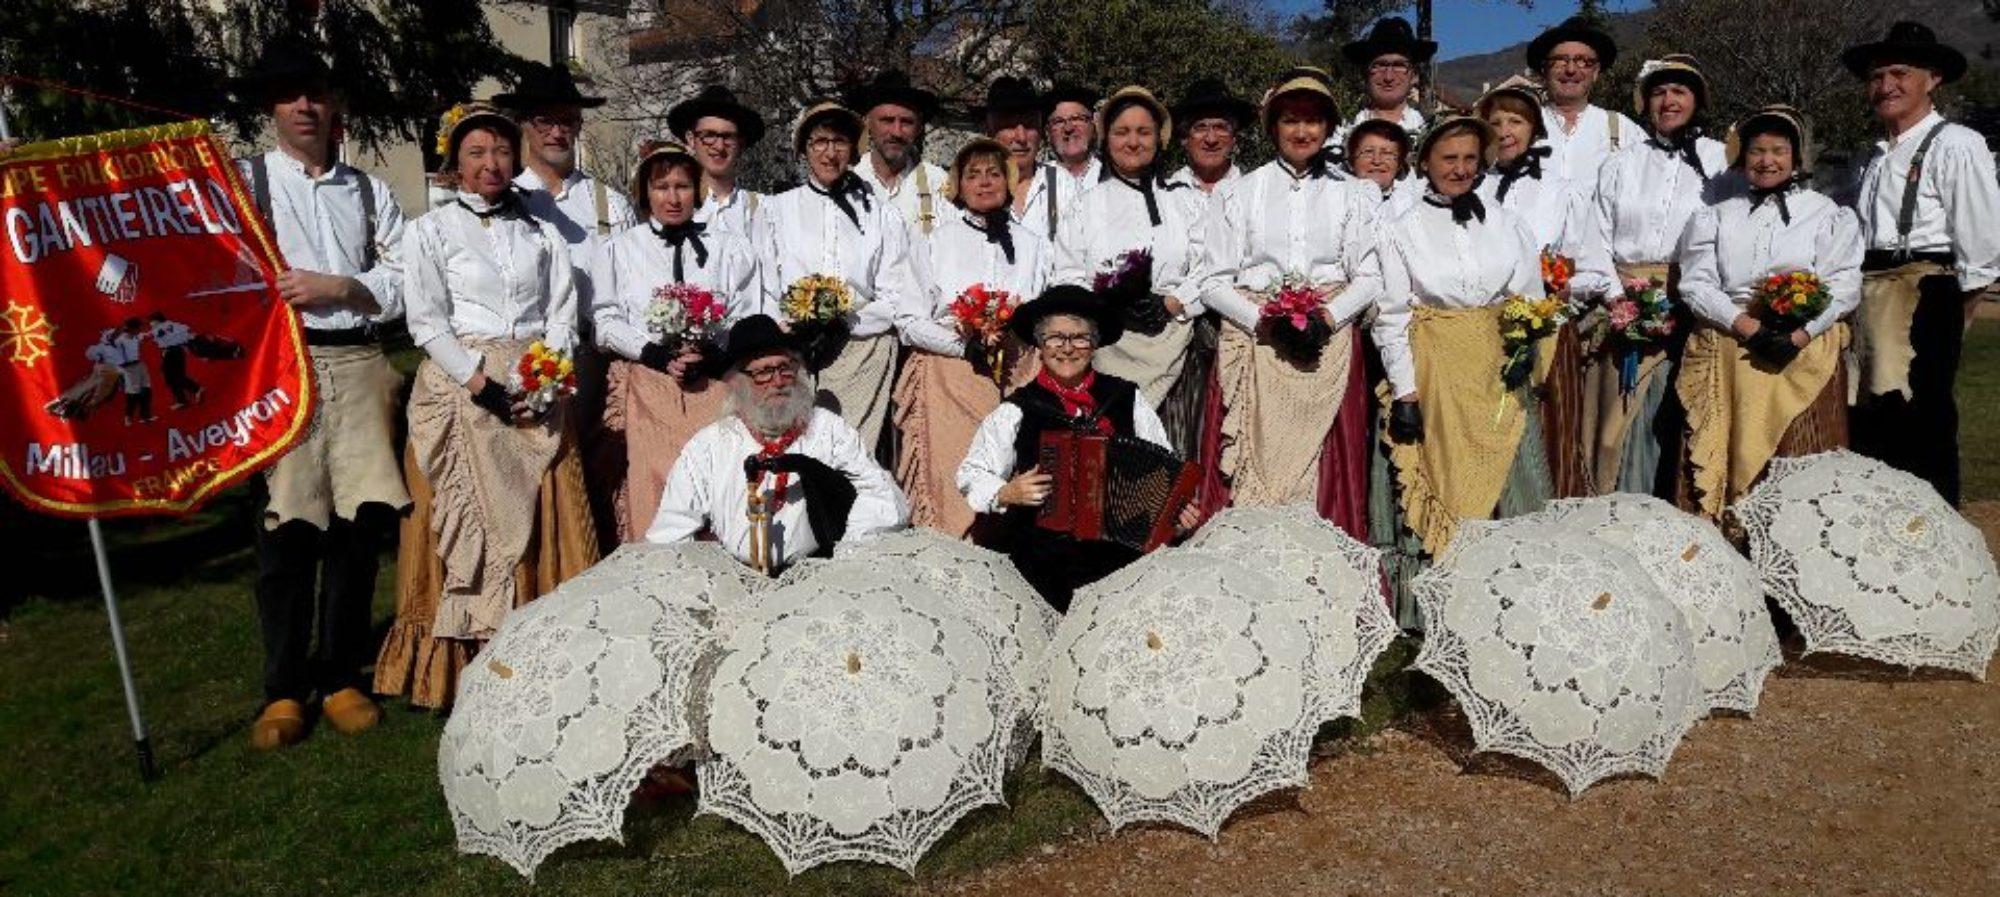 Lo Gantieirelo | Groupe de danse Folklorique